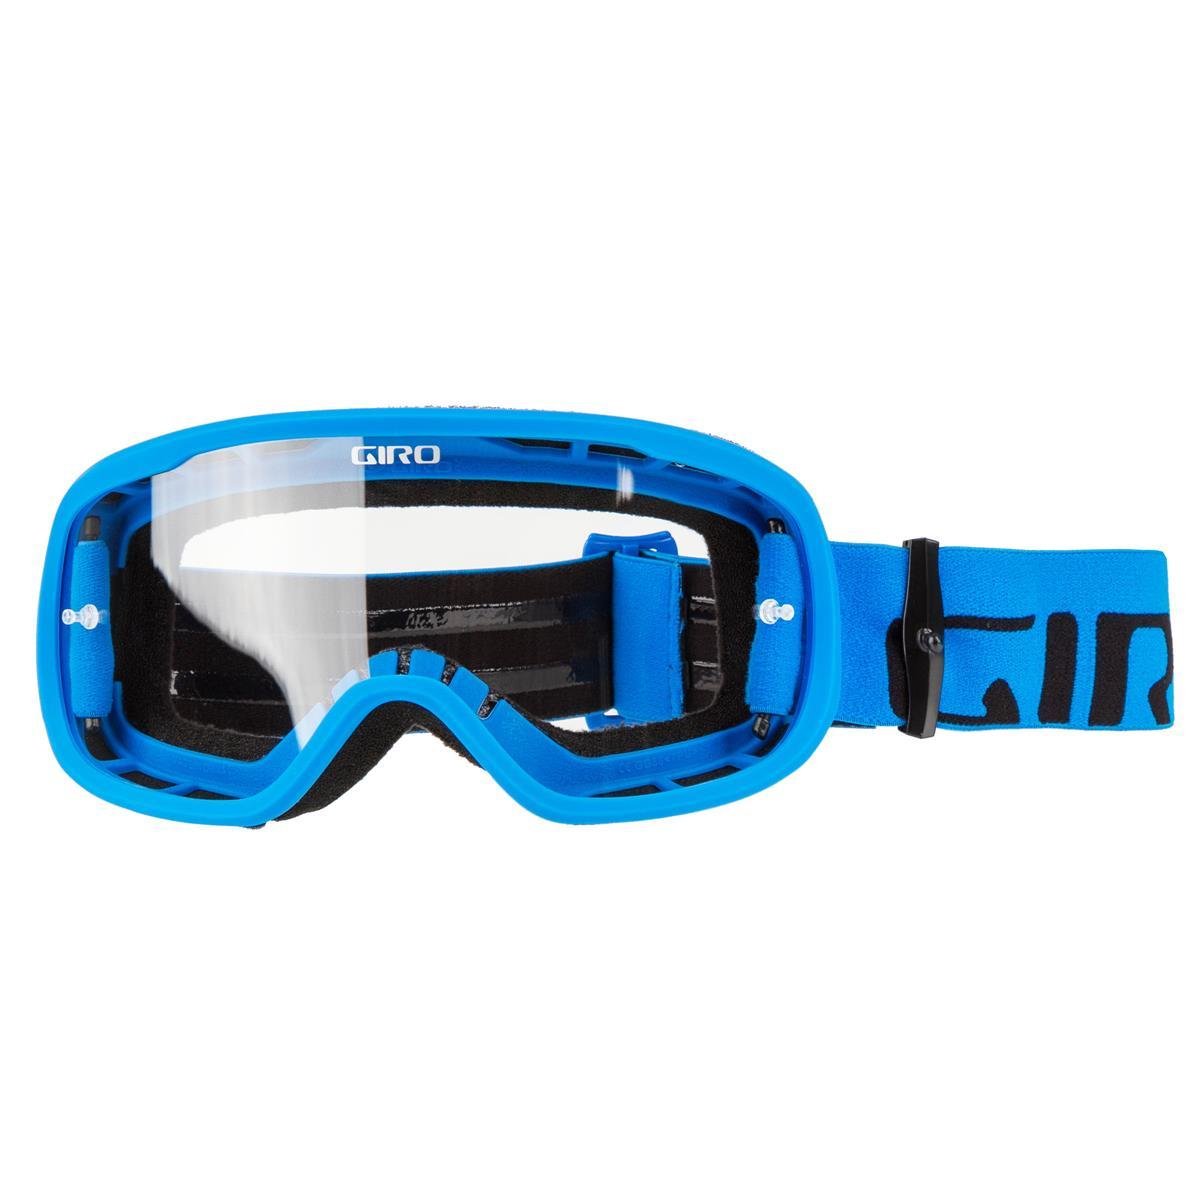 Giro Crossbrille Tempo Blau - Klar Anti-Fog